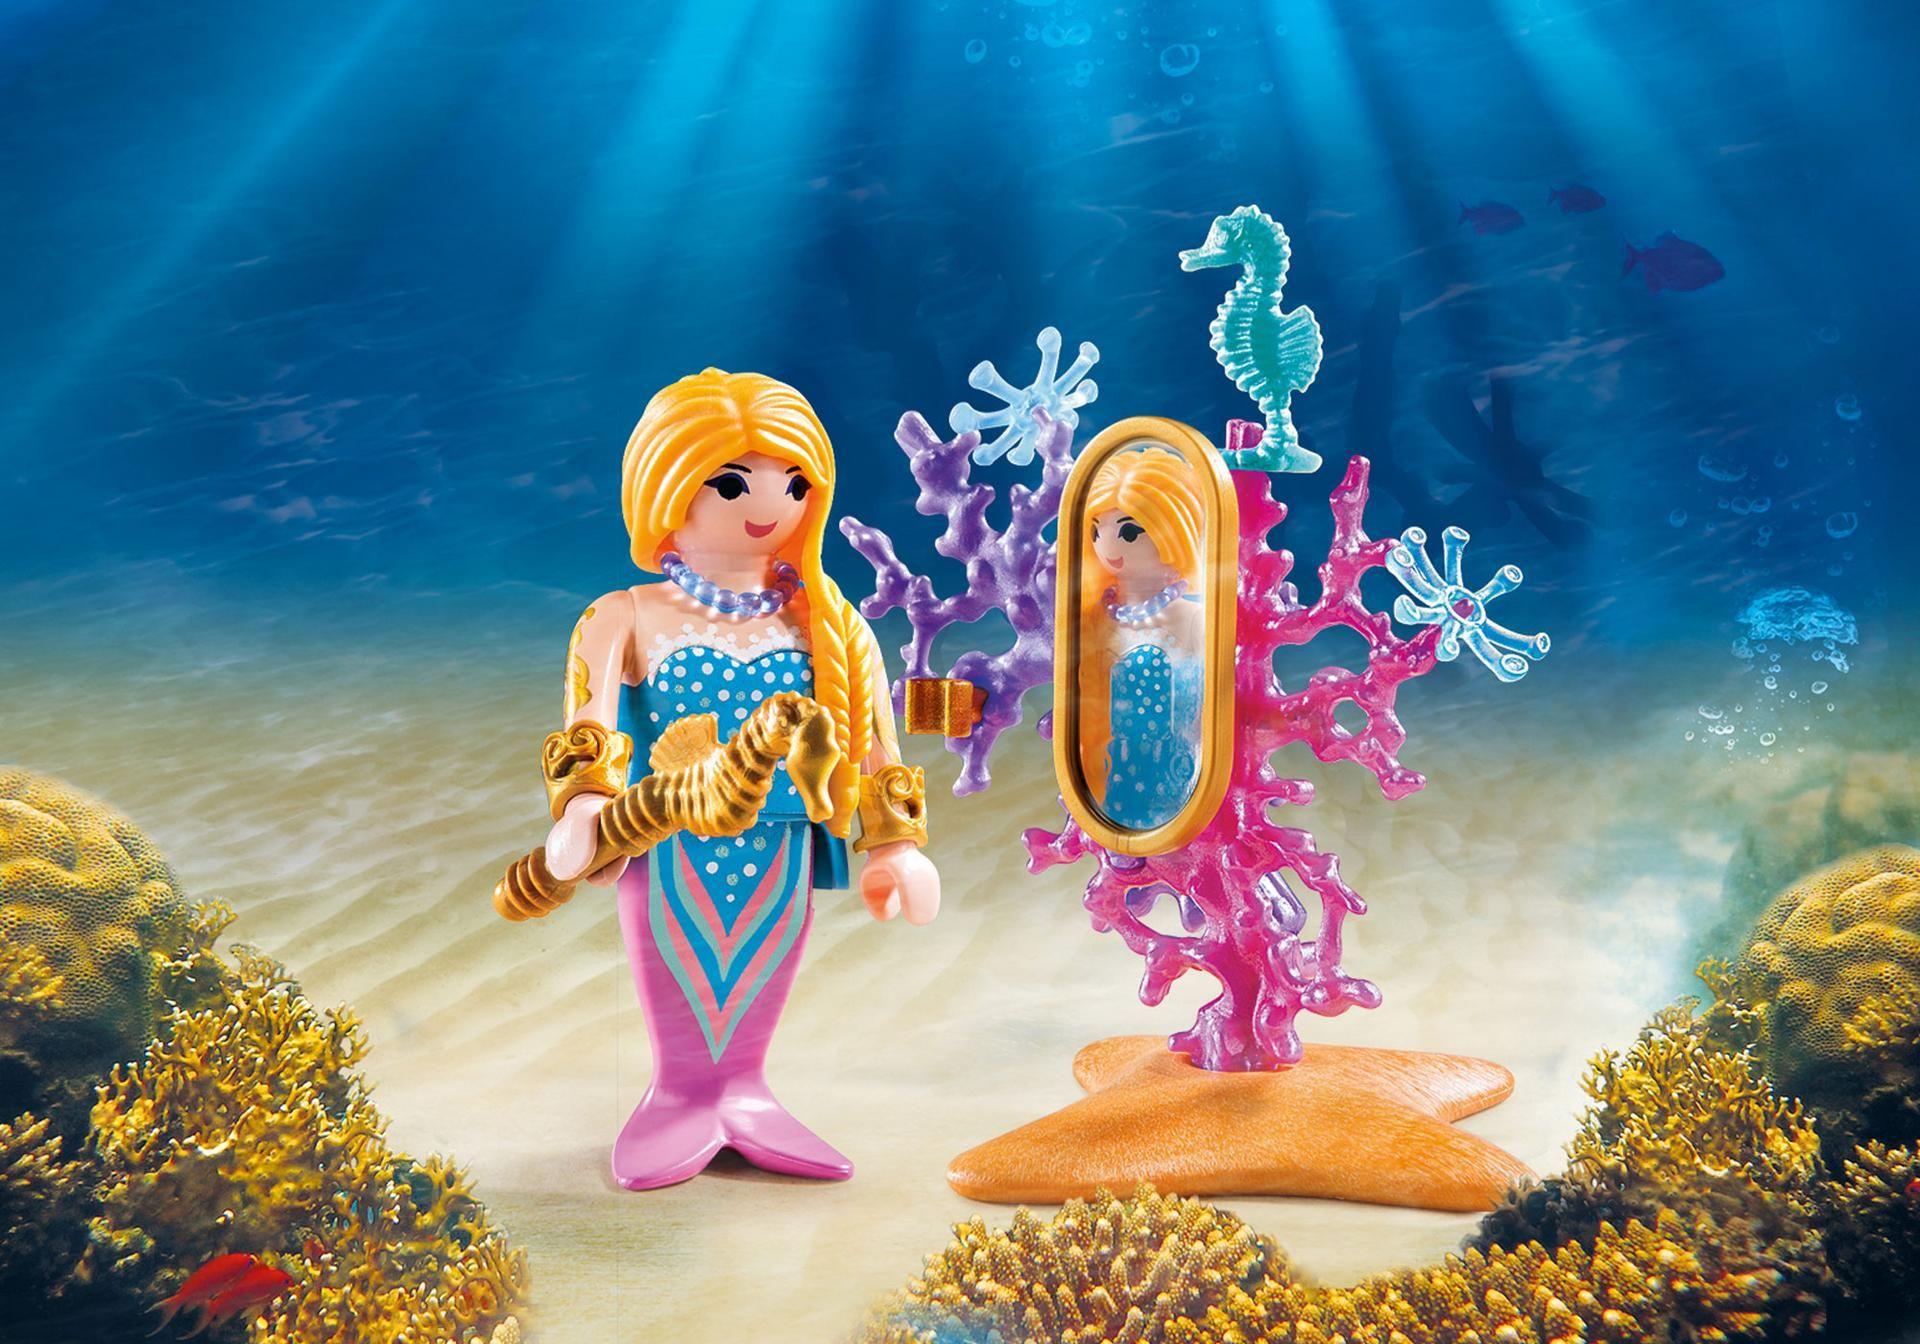 Http Media Playmobil Com I Playmobil 9355 Product Detail Mermaid Figures Playmobil Mermaid